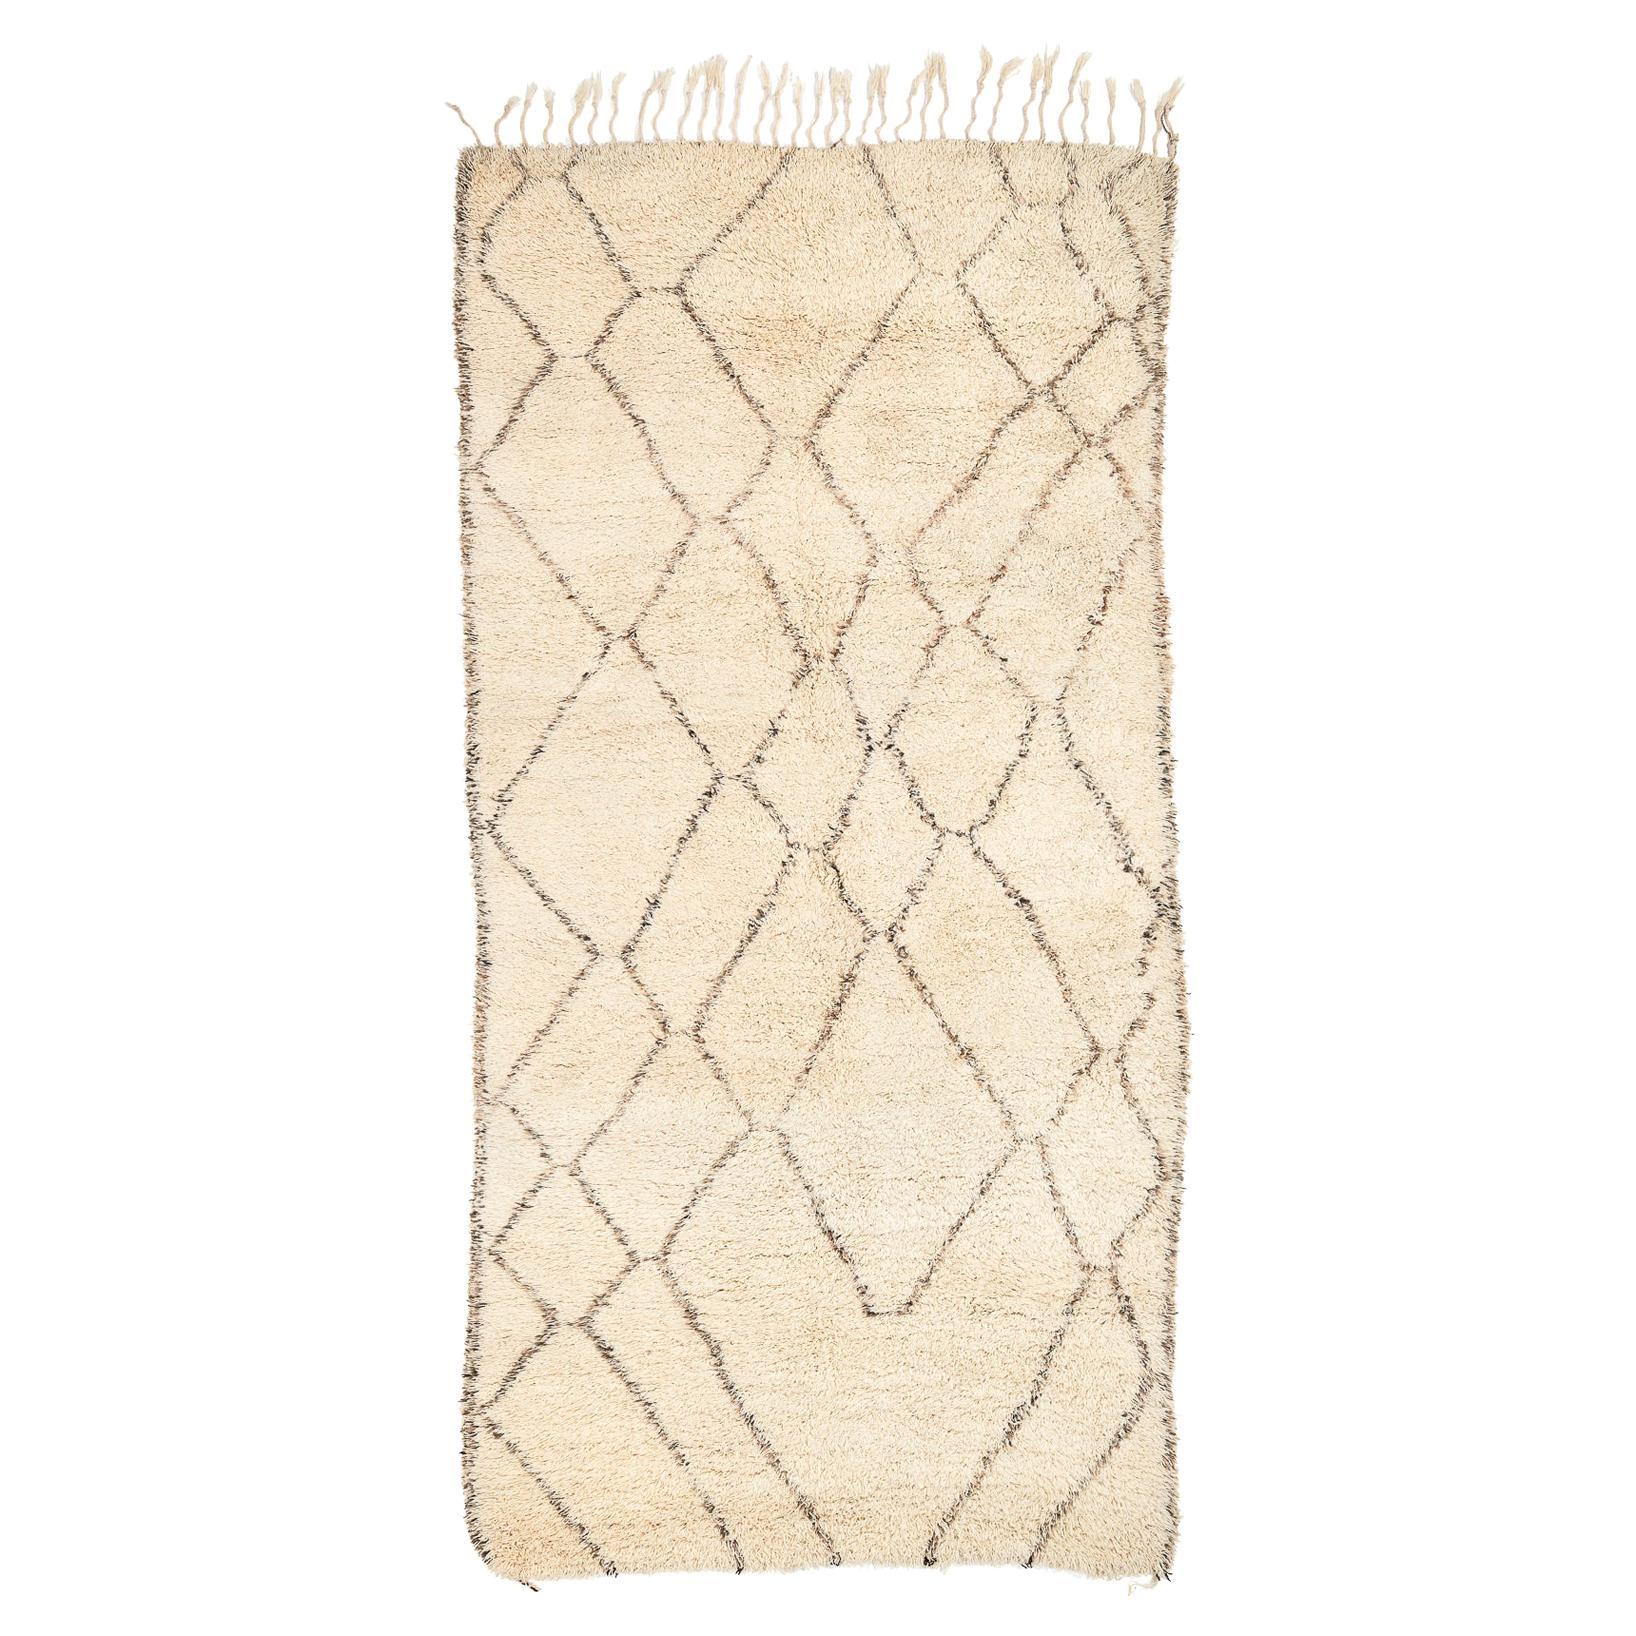 Vintage Beni Ouarain Moroccan Vintage Rug